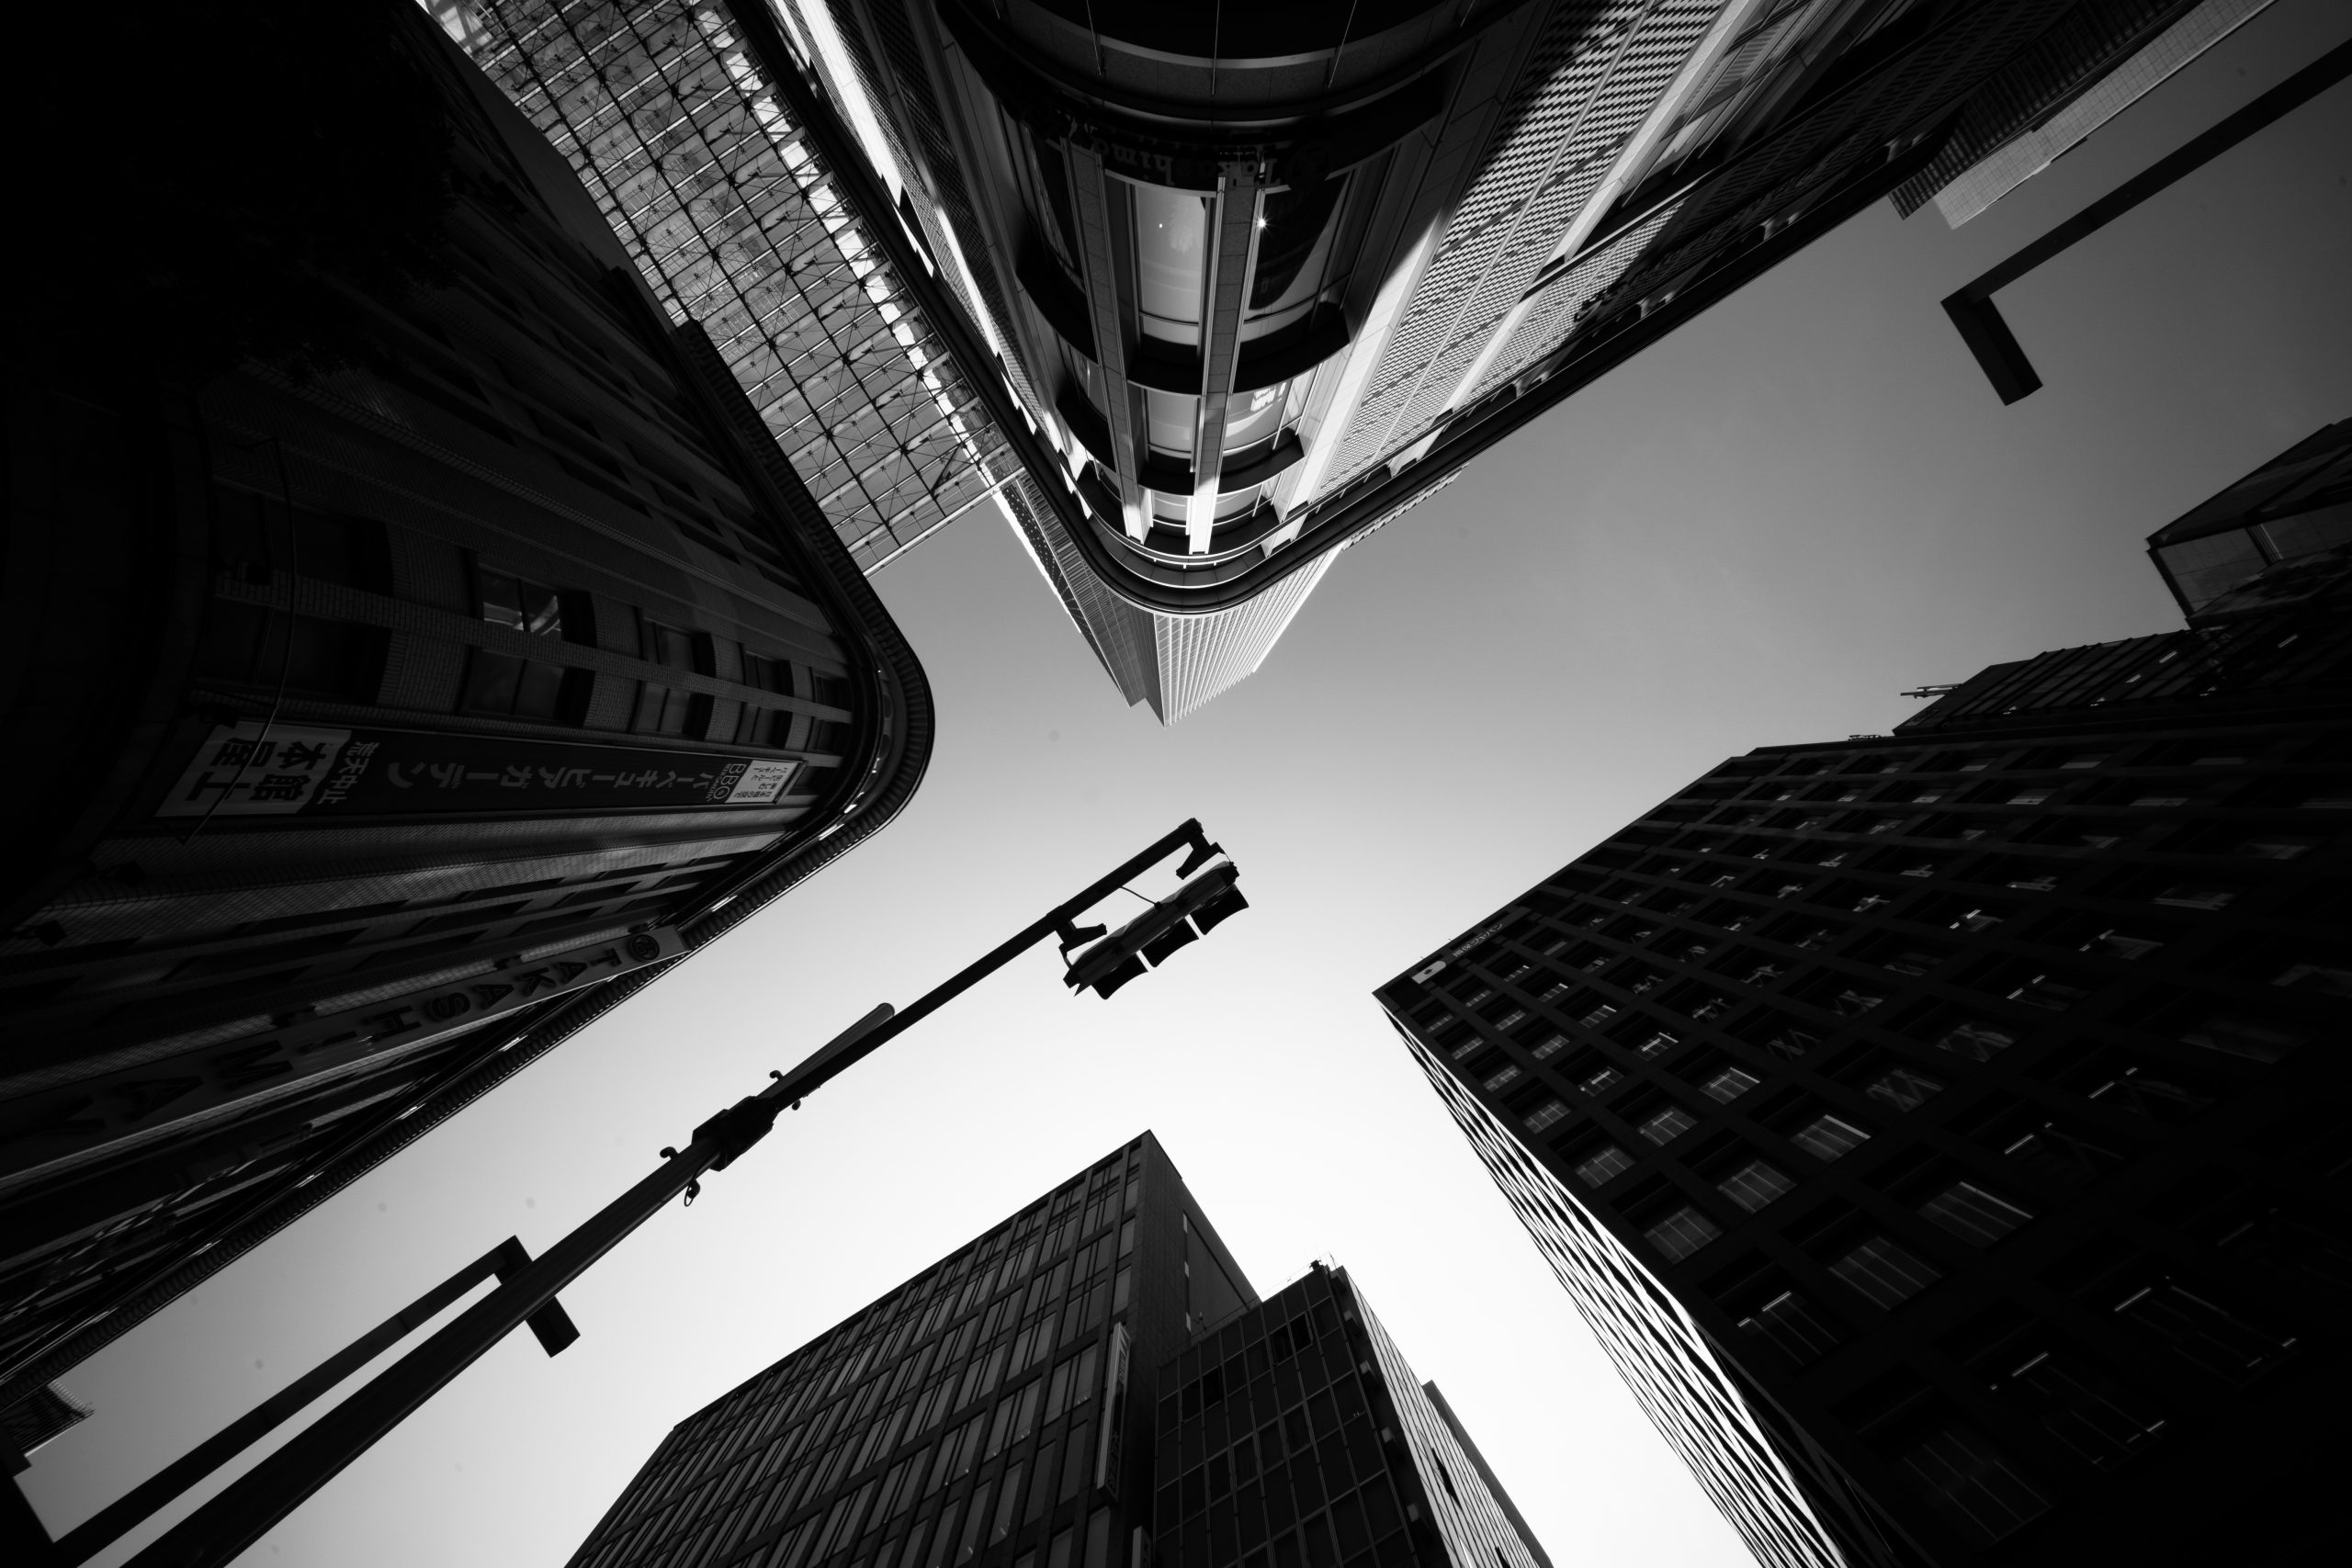 【LAOWA】超広角レンズ LAOWA 9mm F5.6 W-DREAMER で撮った街並み